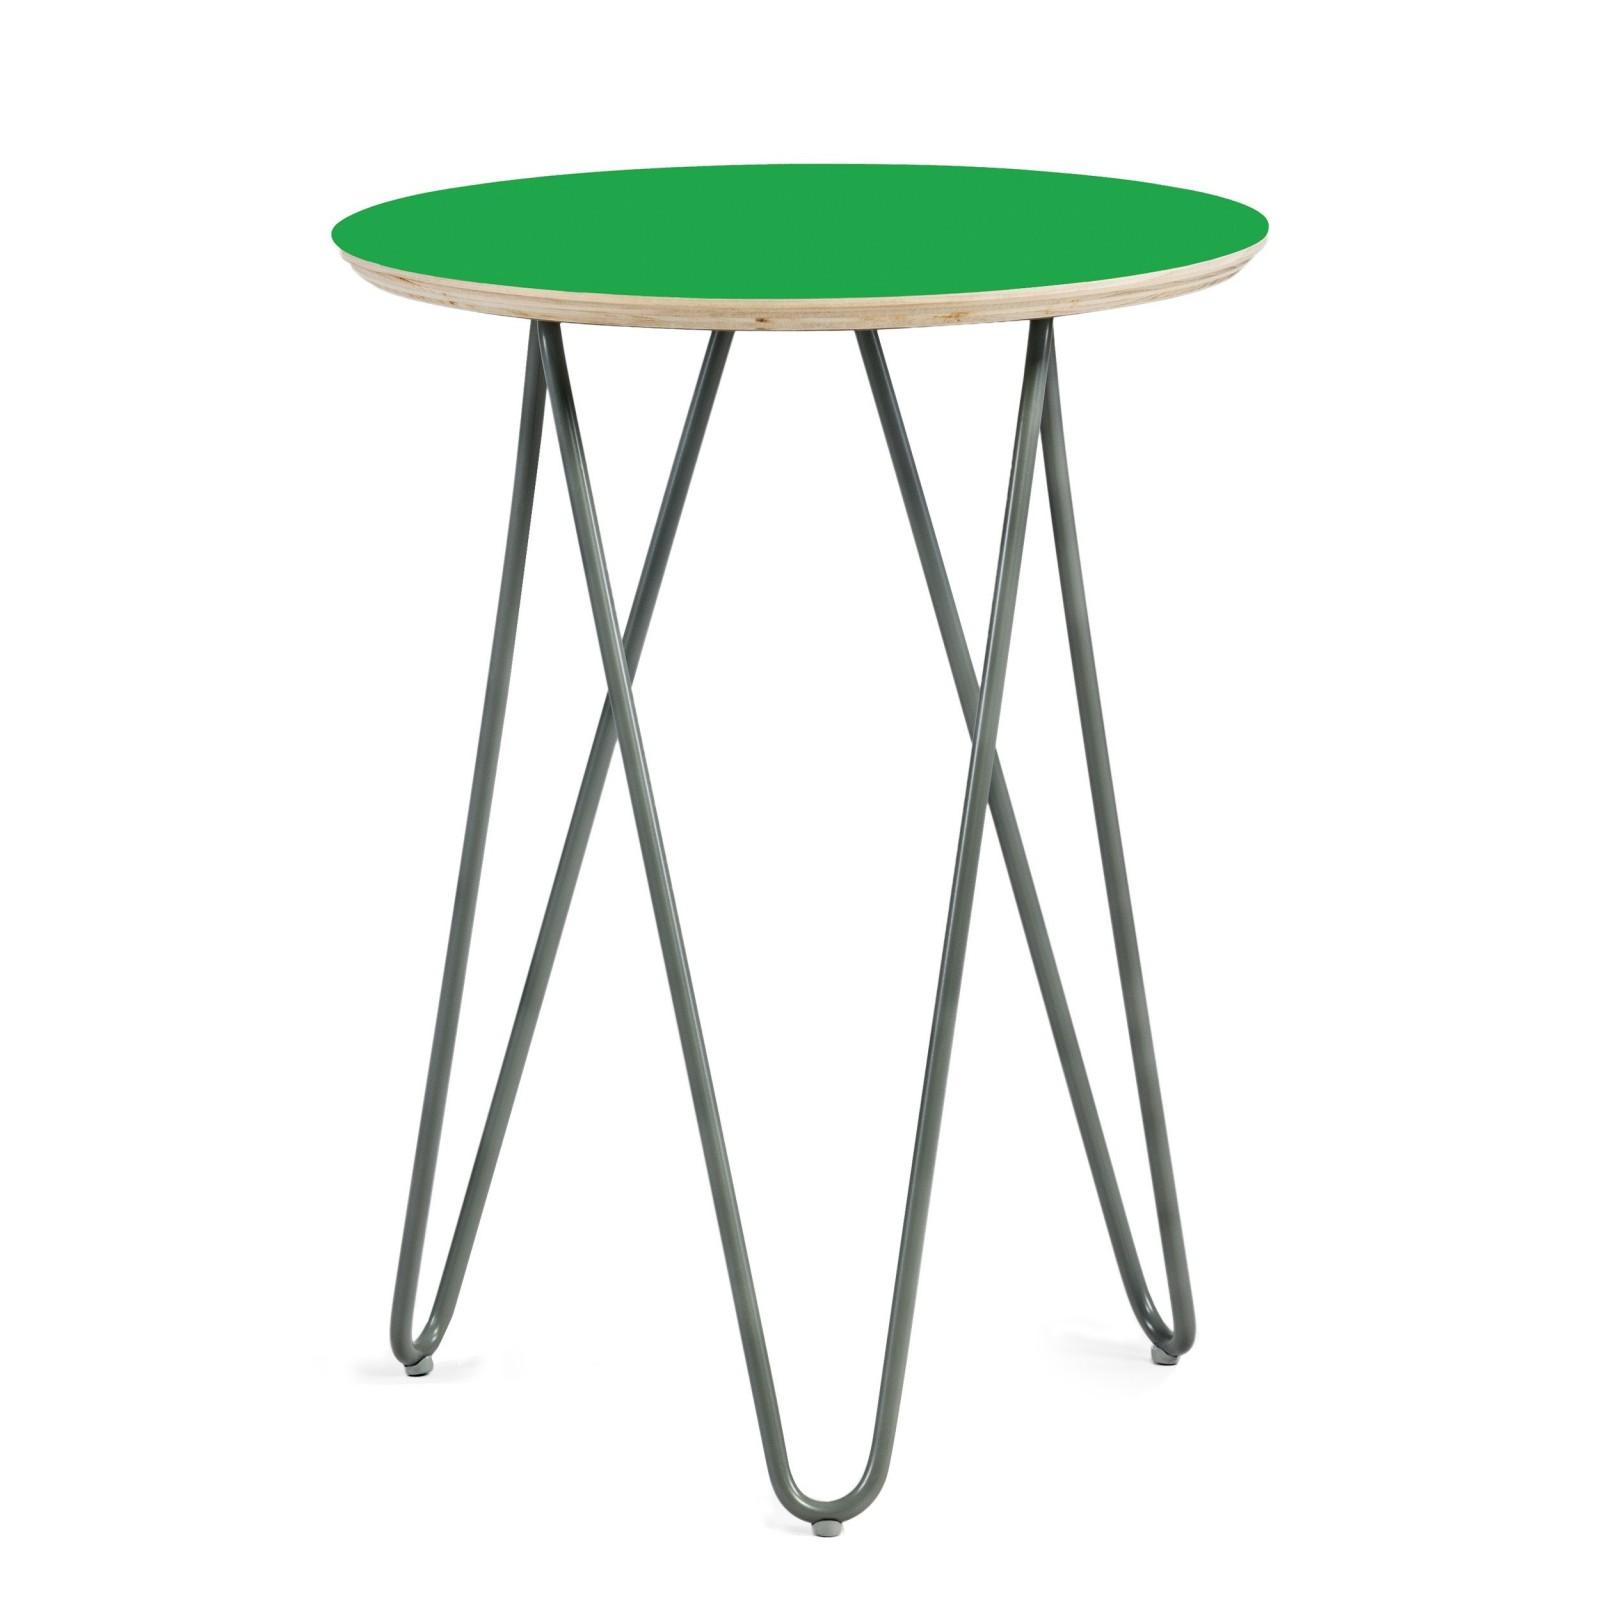 Stolik Zig-Zag  R 40 -  zielony